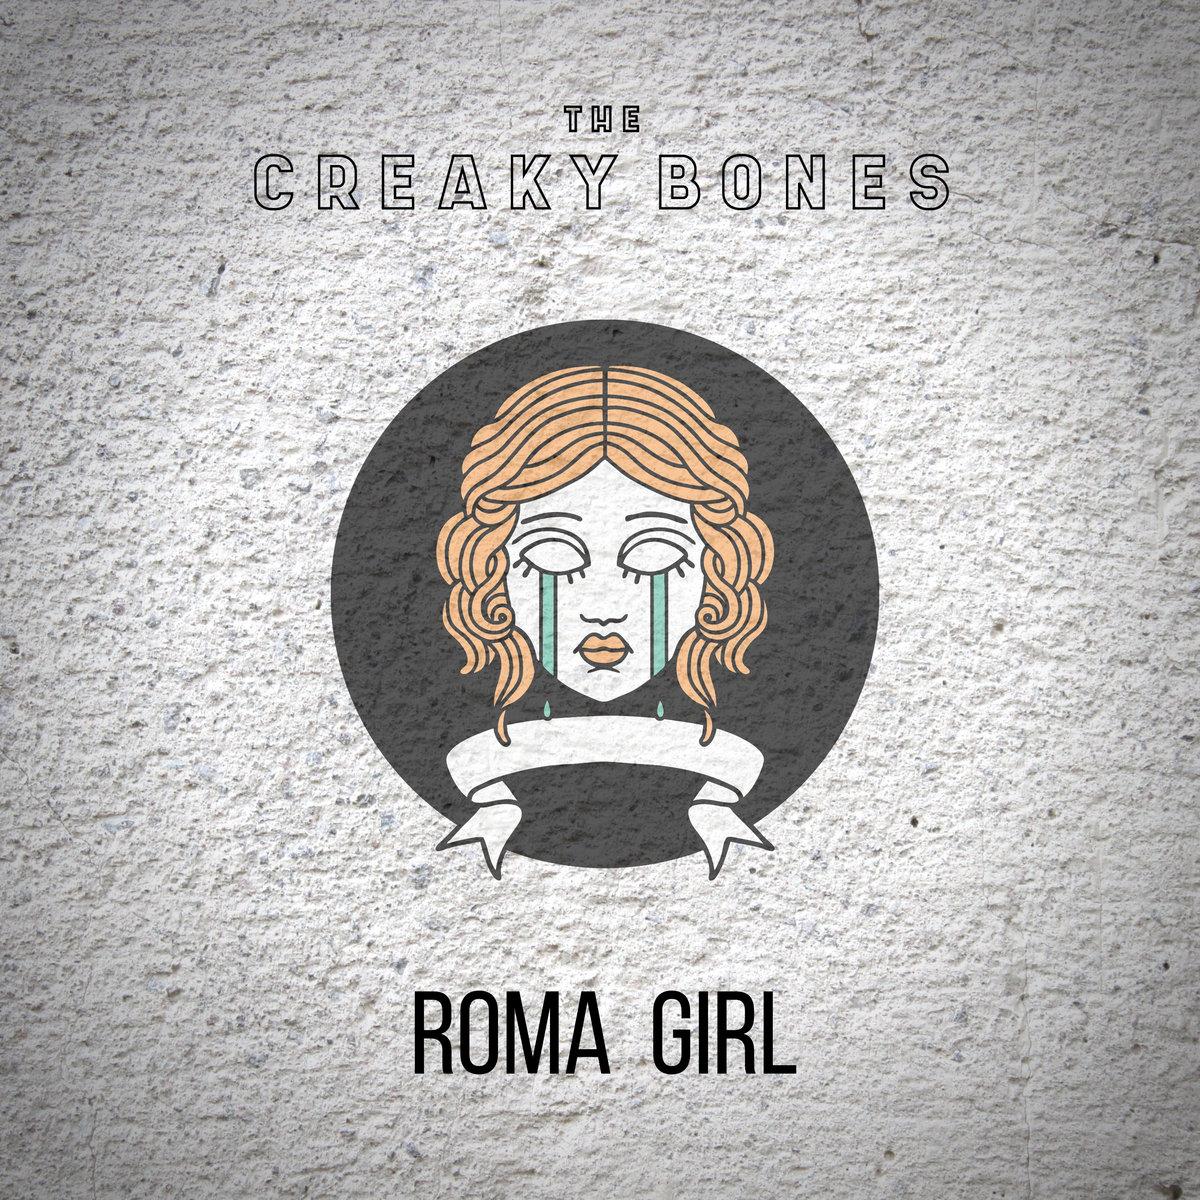 Roma Girl by The Creaky Bones